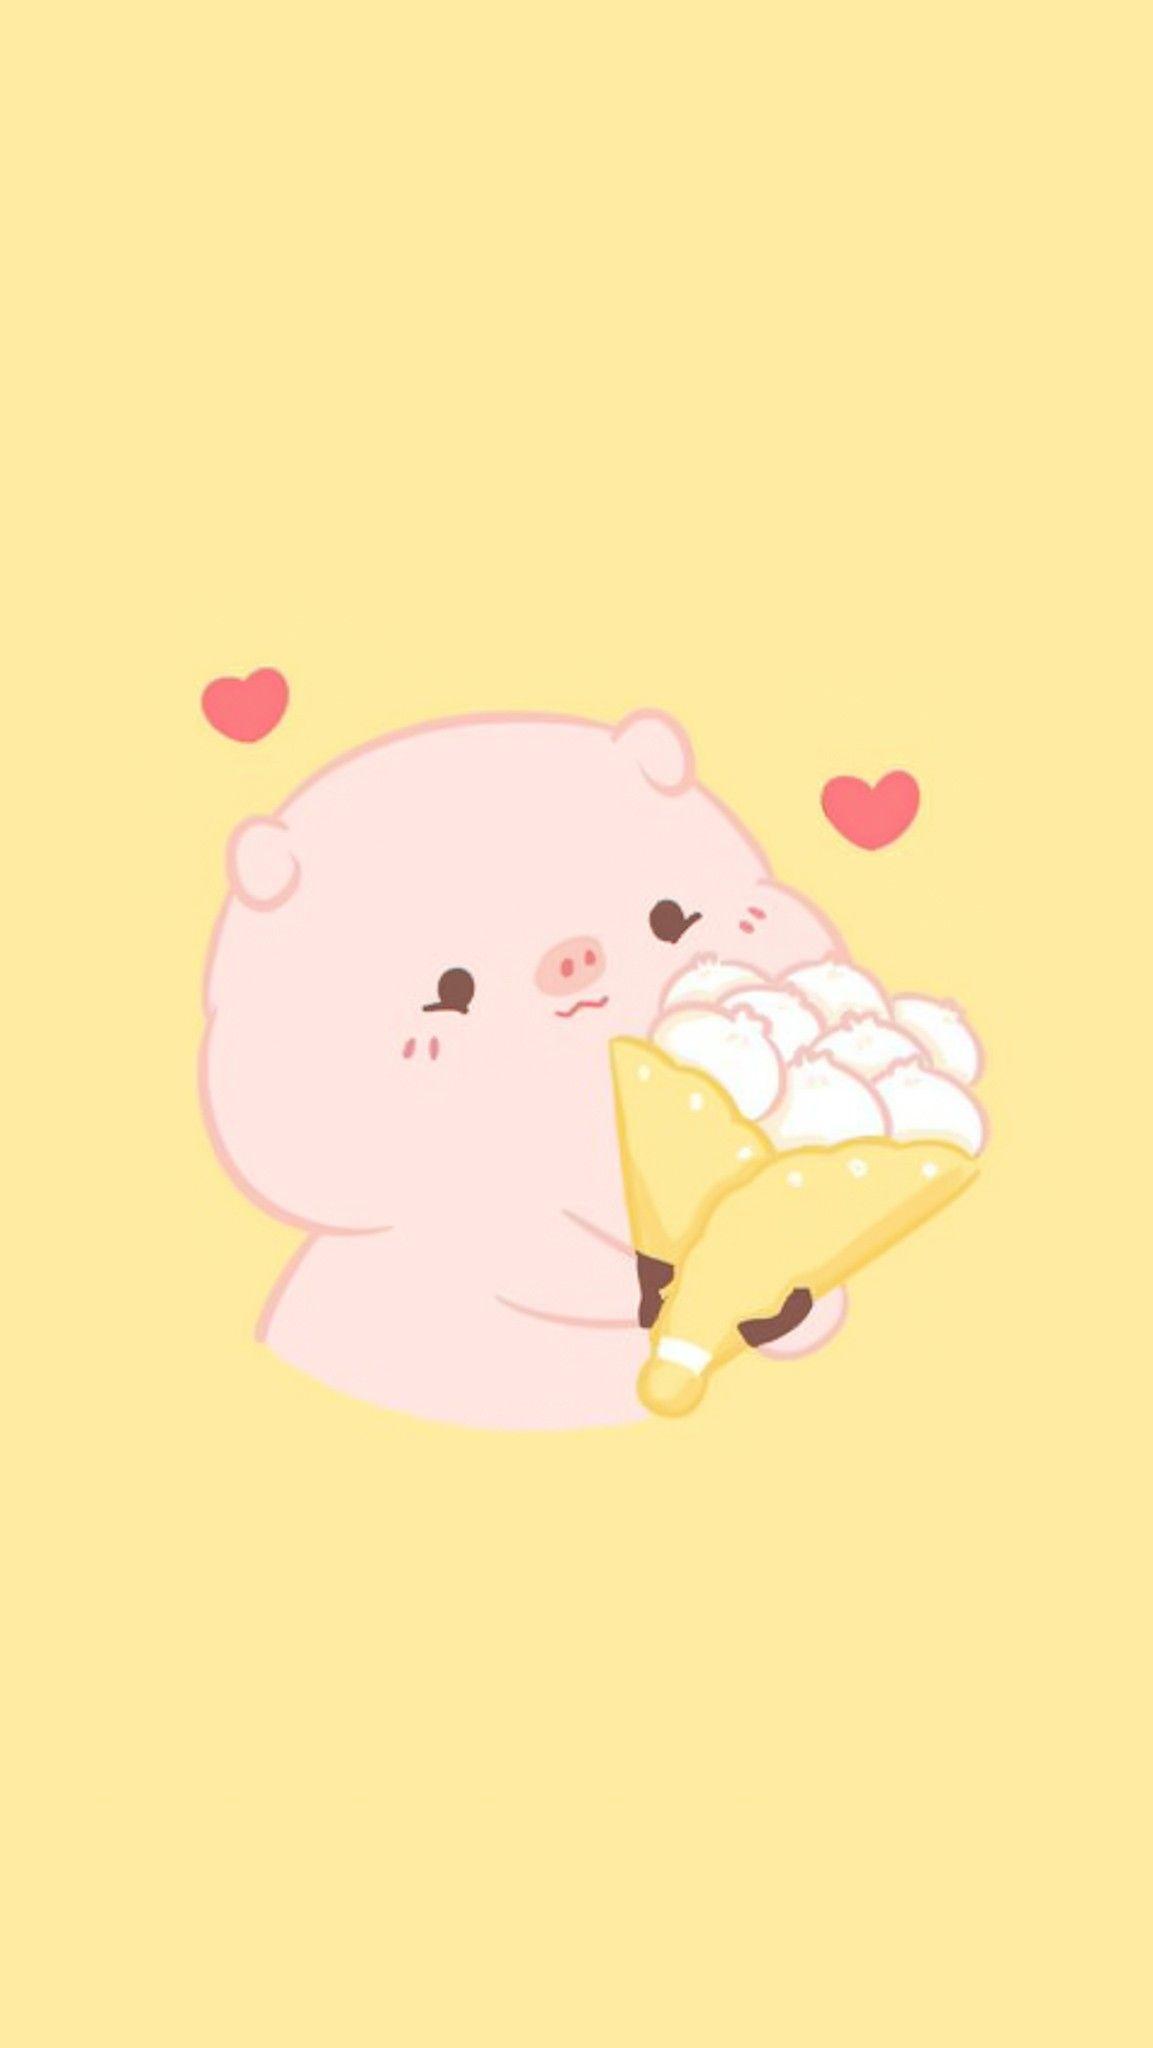 Pin By Mel On Bg Ct Cute G In 2020 Cute Cartoon Wallpapers Cute Wallpapers Pig Wallpaper